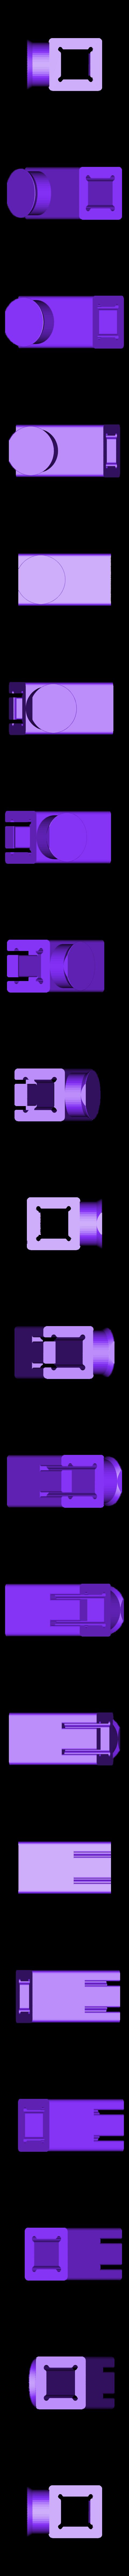 Exterior_slide.stl Download STL file Armillary phone Holder • Design to 3D print, 3d-fabric-jean-pierre